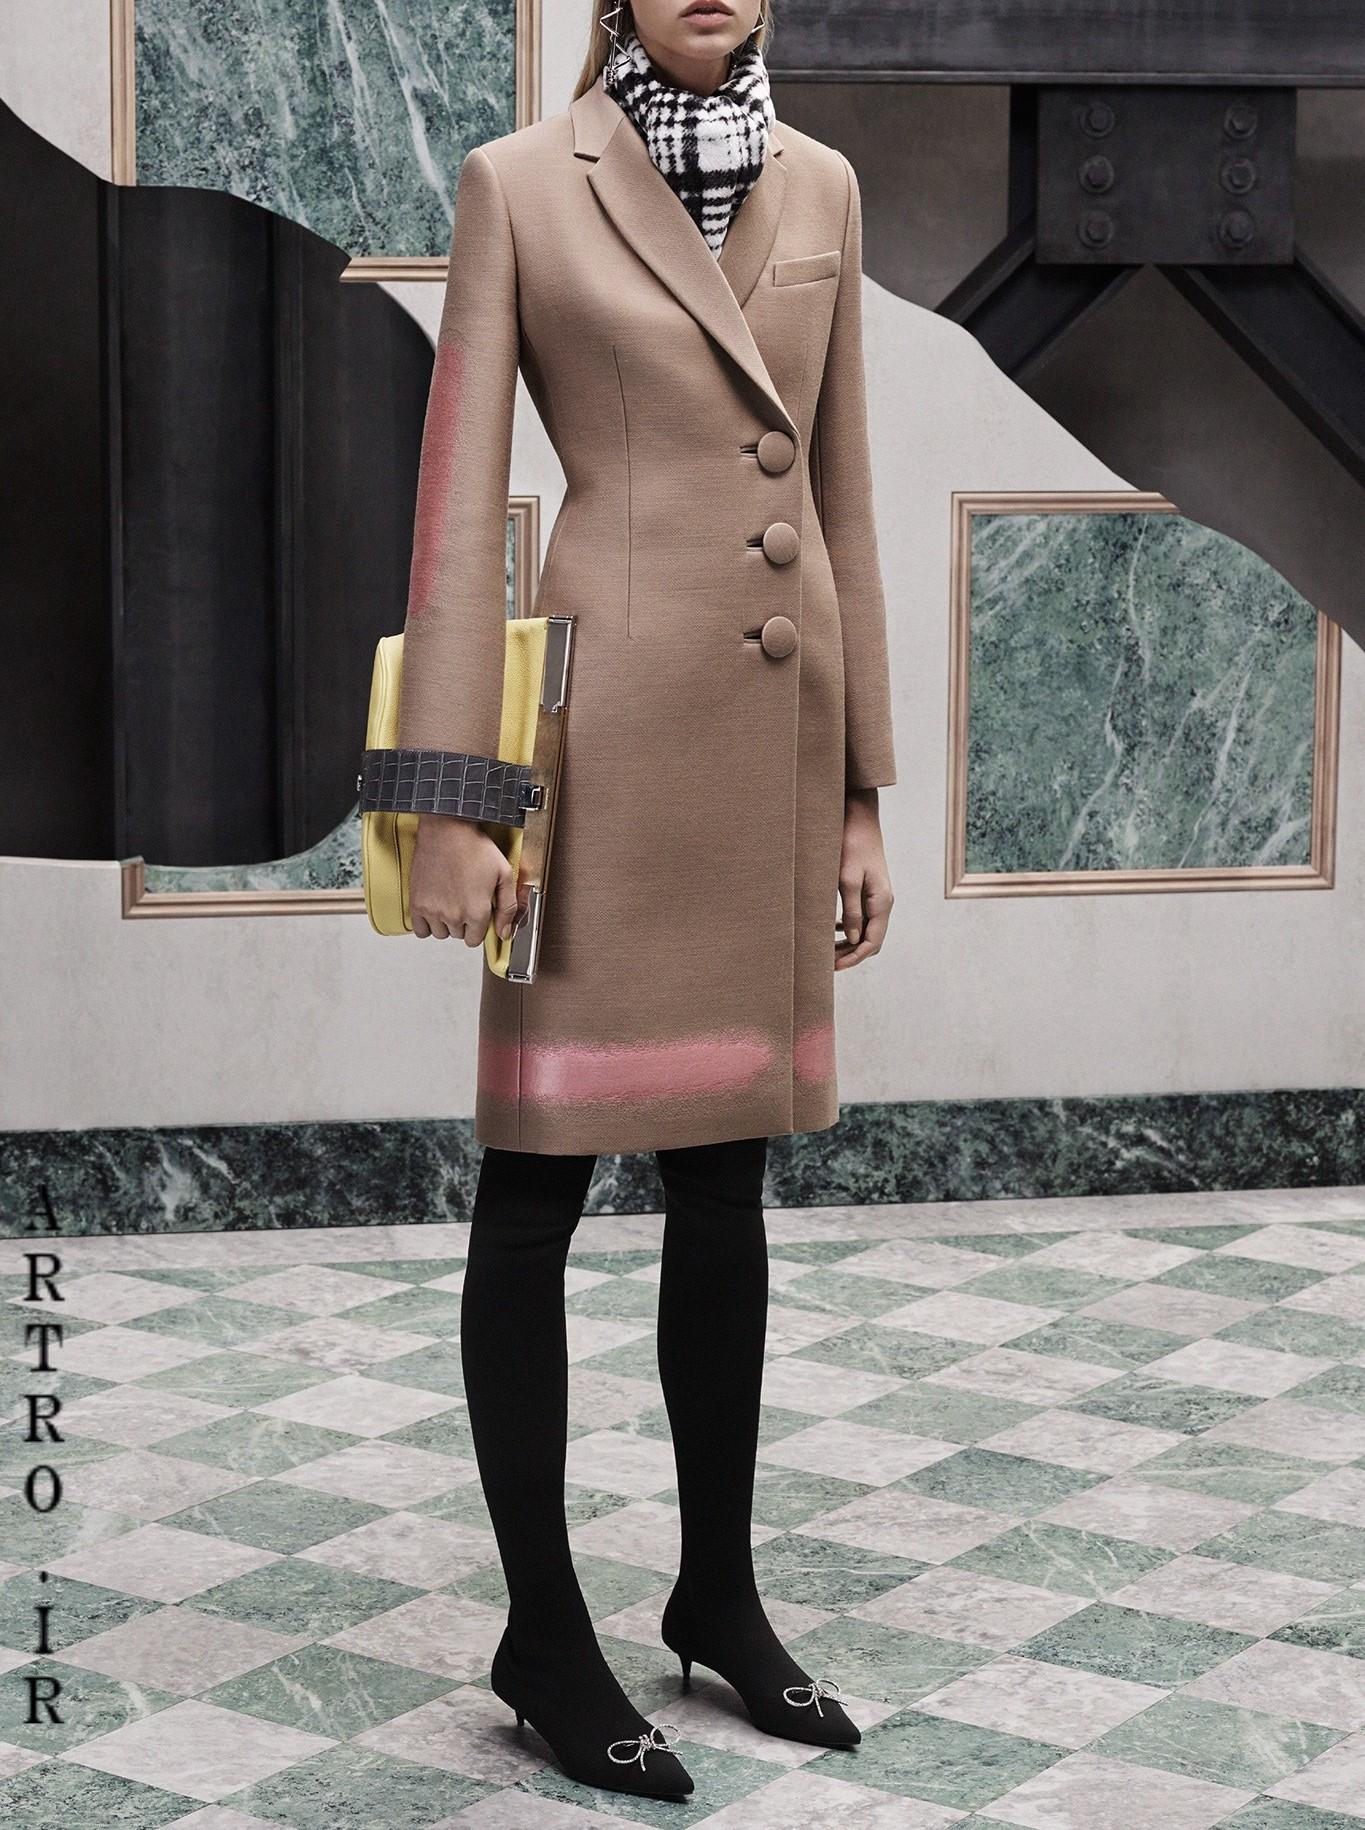 بروزترین مدل پالتو زنانه 7